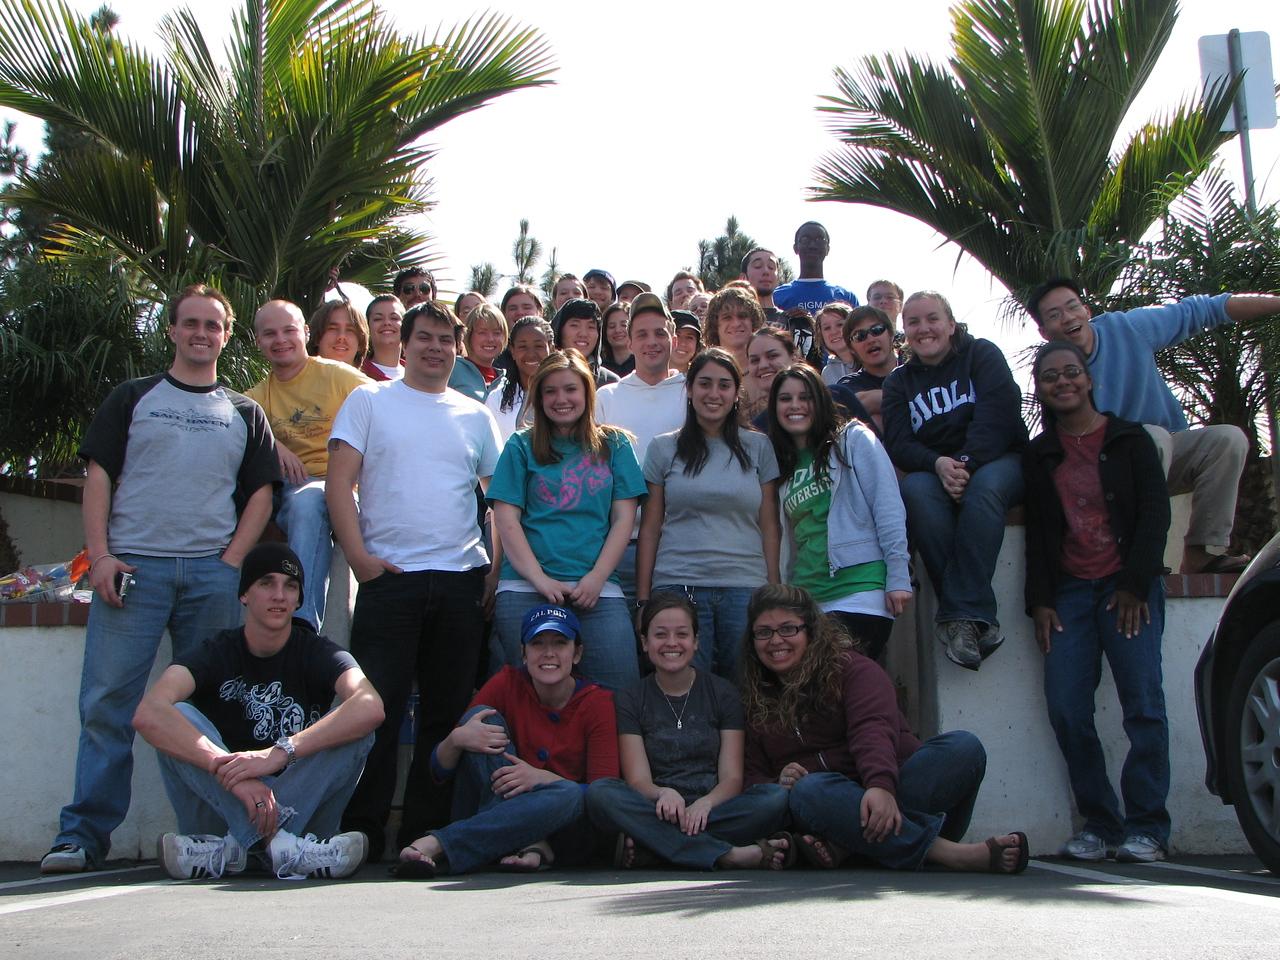 2007 03 03 Sat - Group pic 1